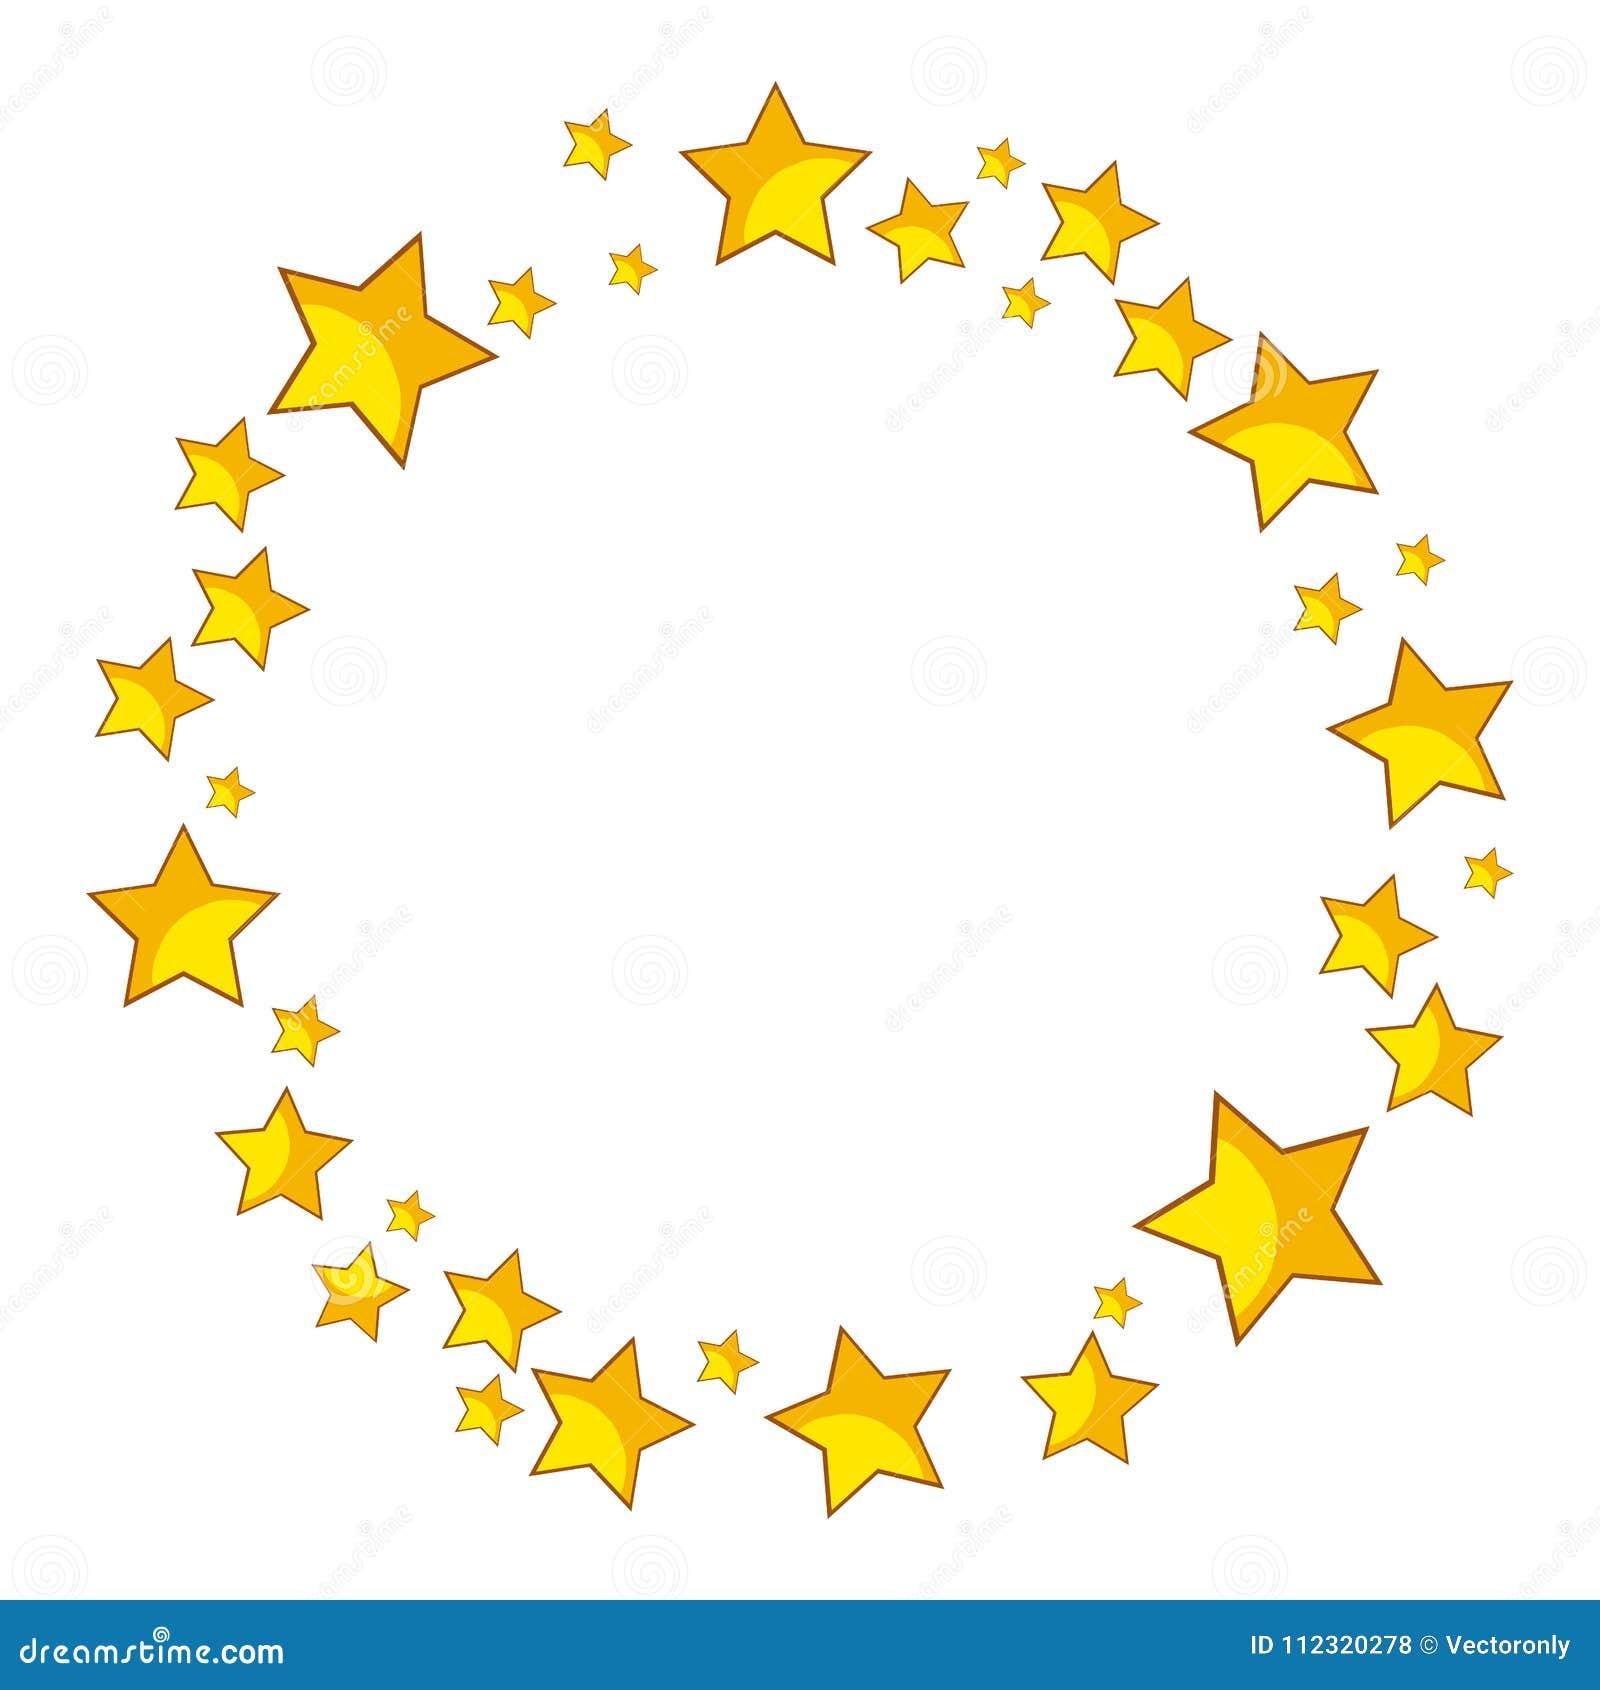 3f5cb90ac295 Golden Stars Round Border Vector Stock Vector - Illustration of gold ...